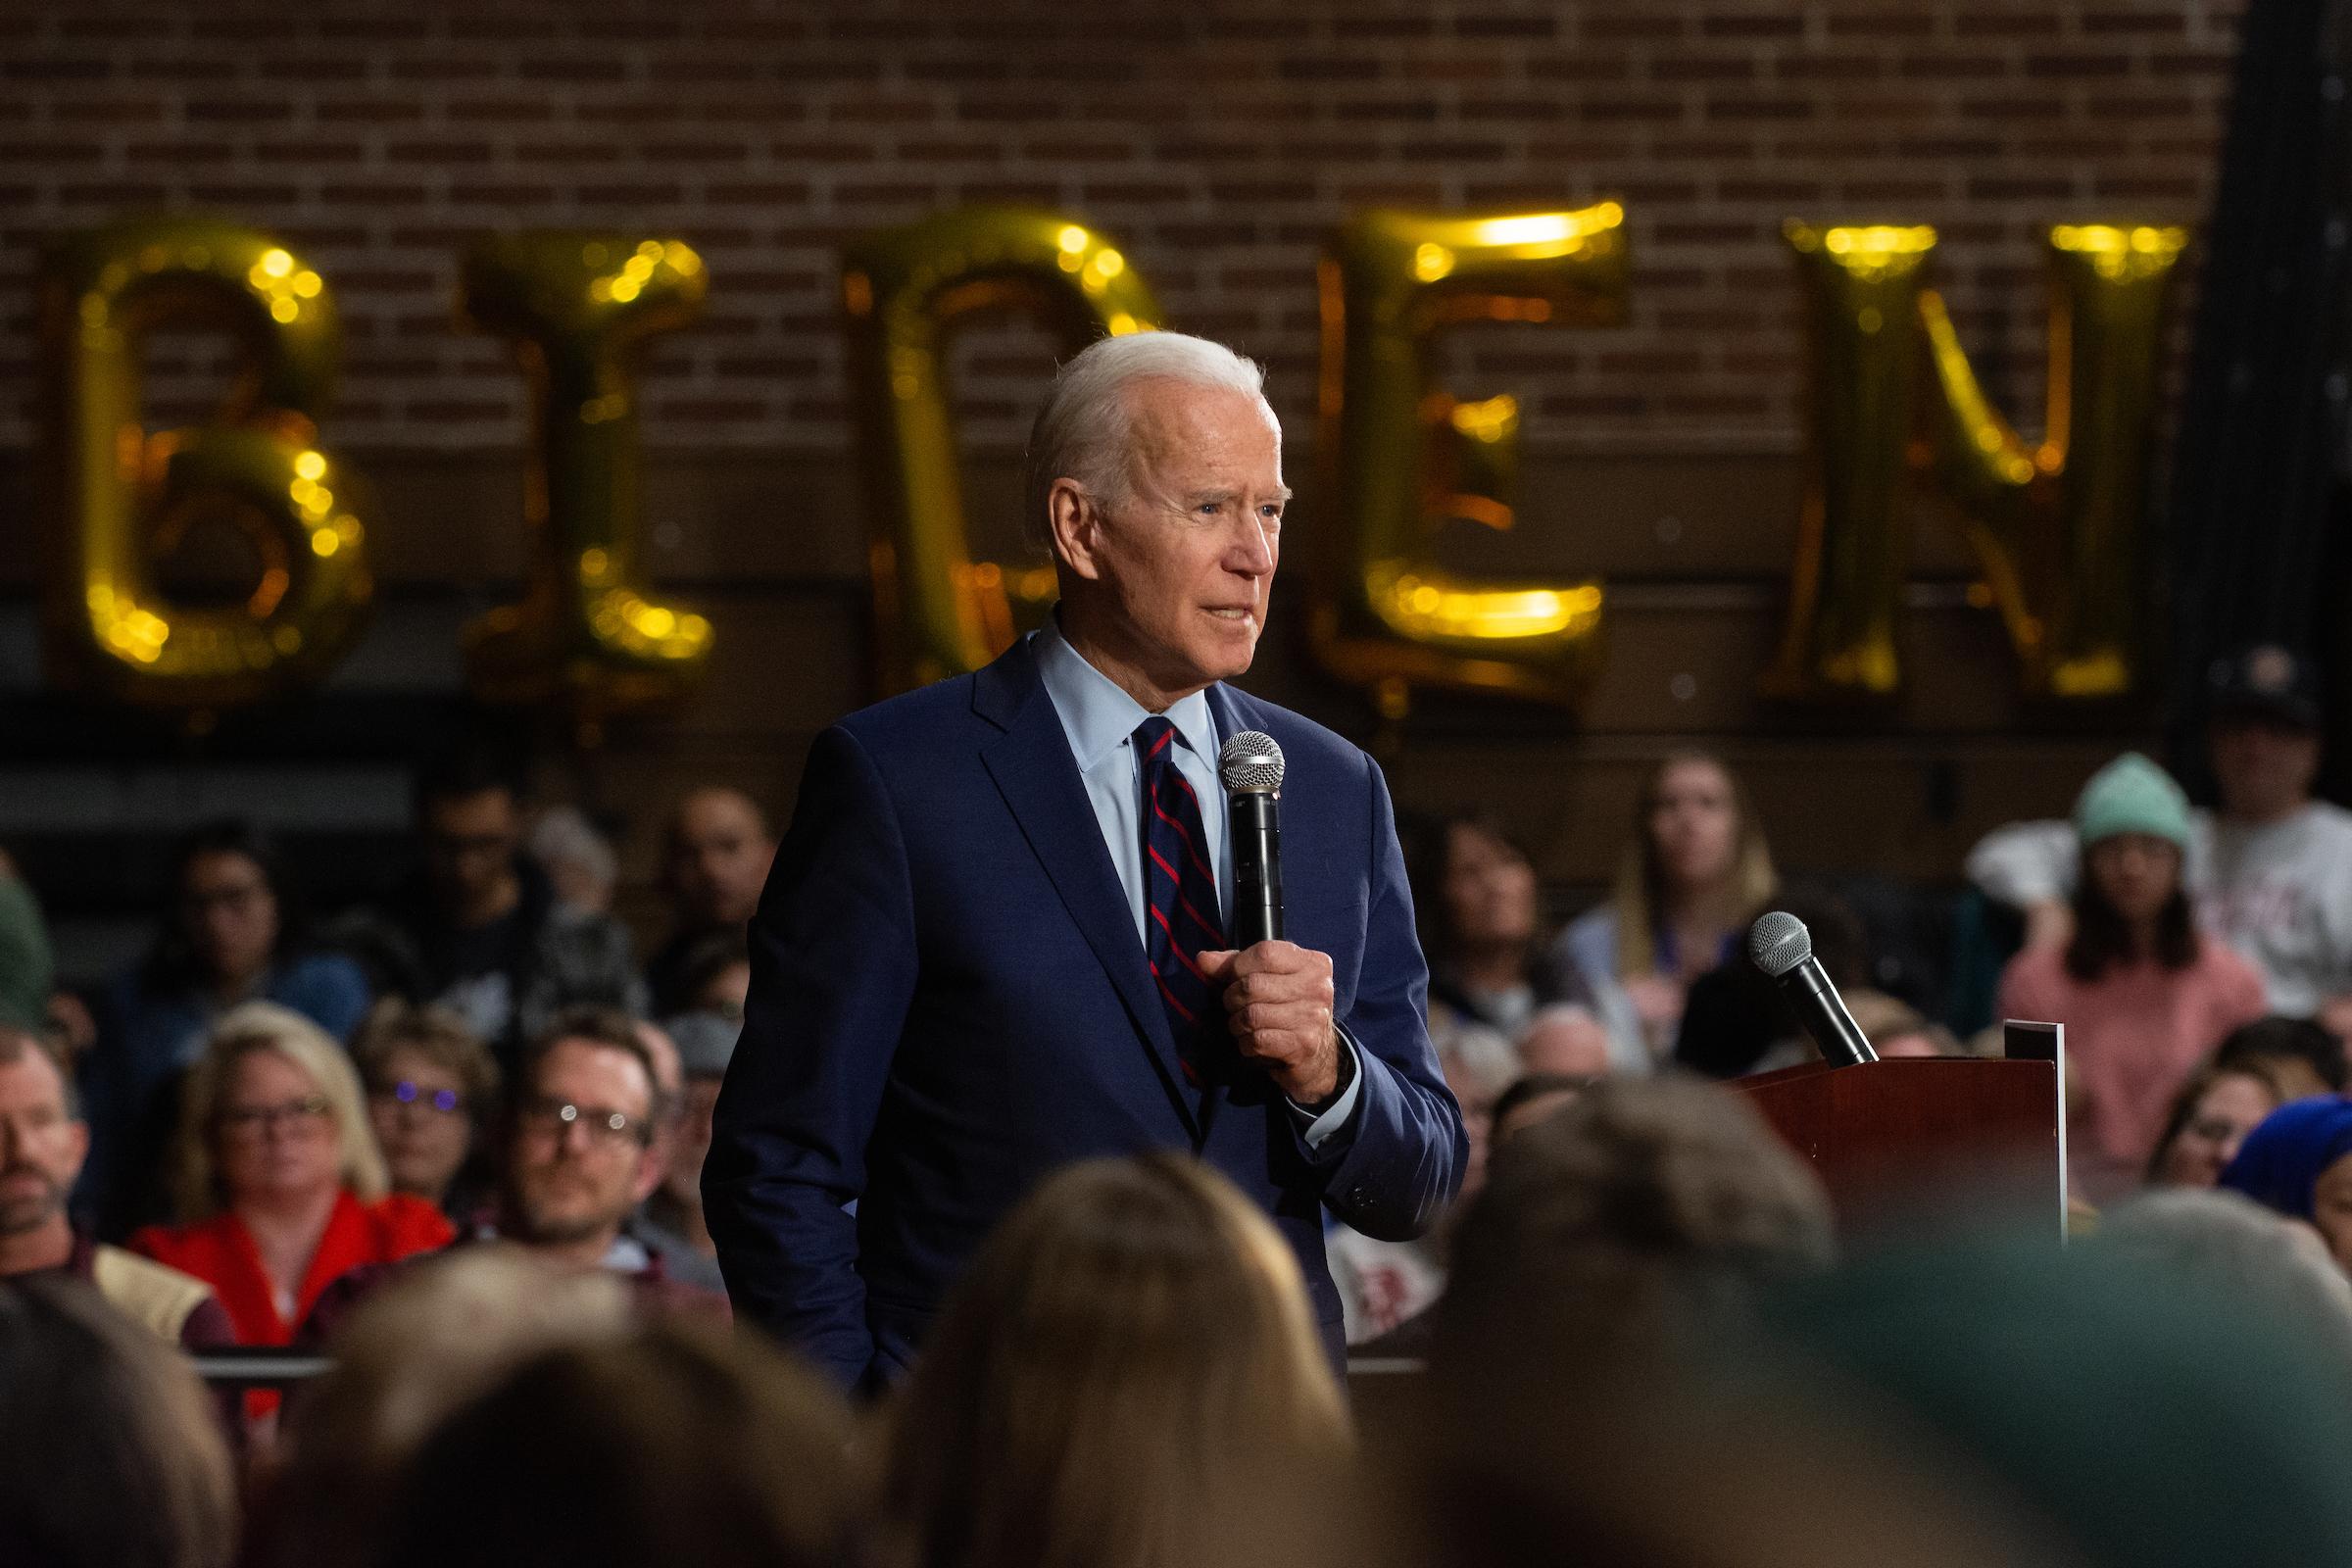 Joe Biden at Sparks rally